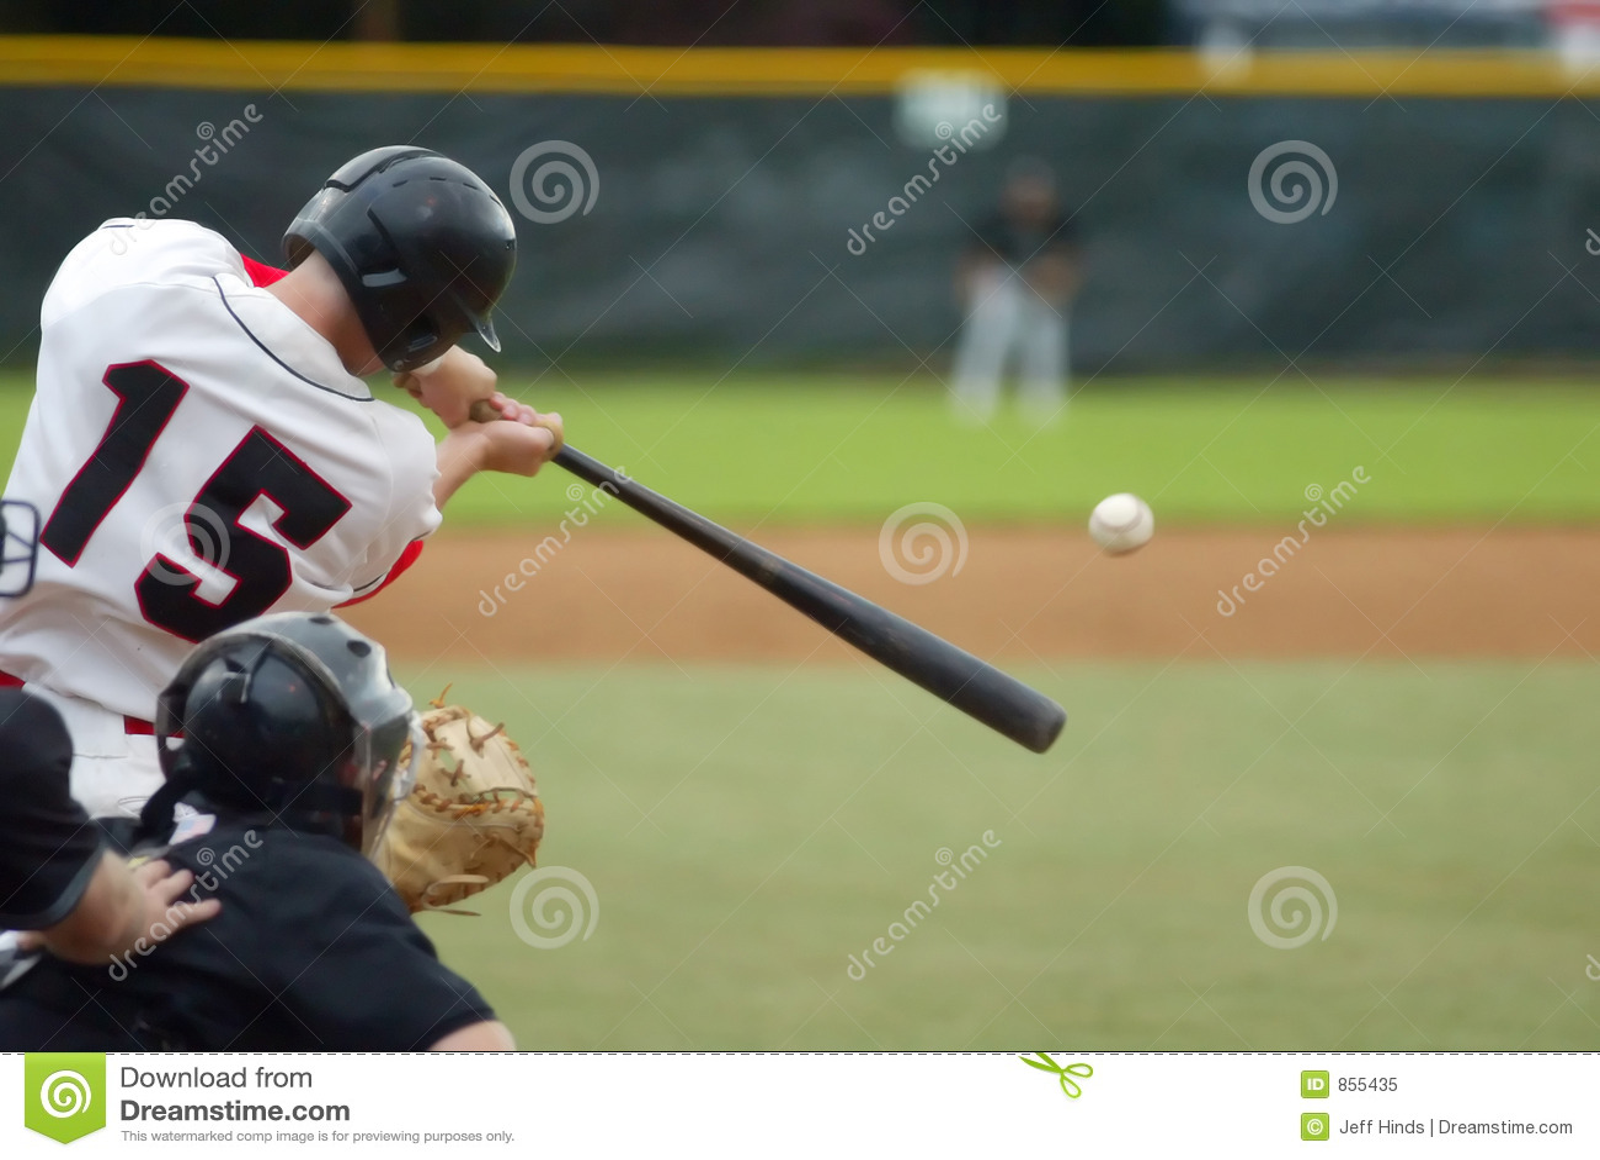 Batida do basebol!